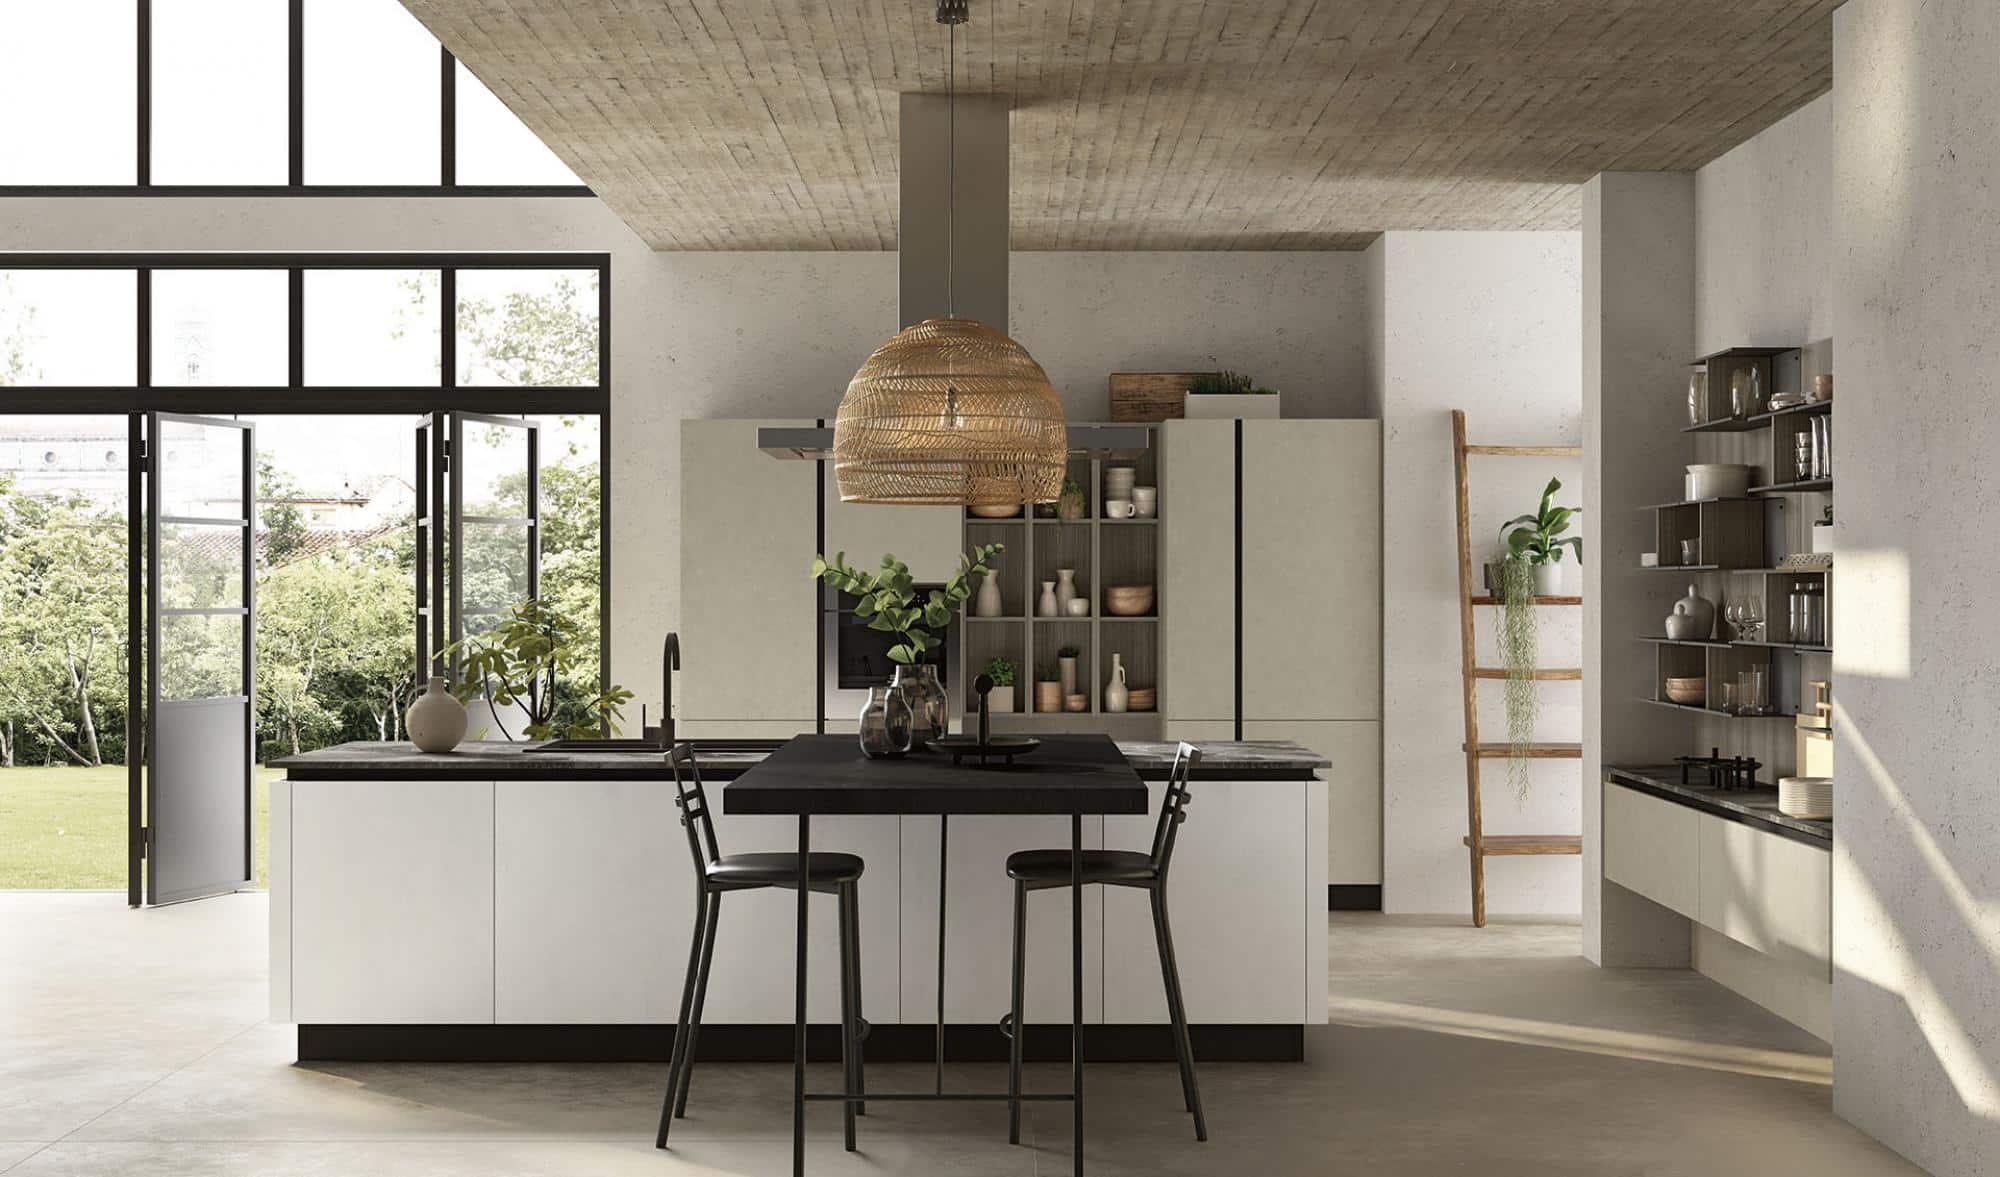 Lungomare κουζινα χωρις πομολο με υφη τσιμέντου λευκο λεπτομερειες